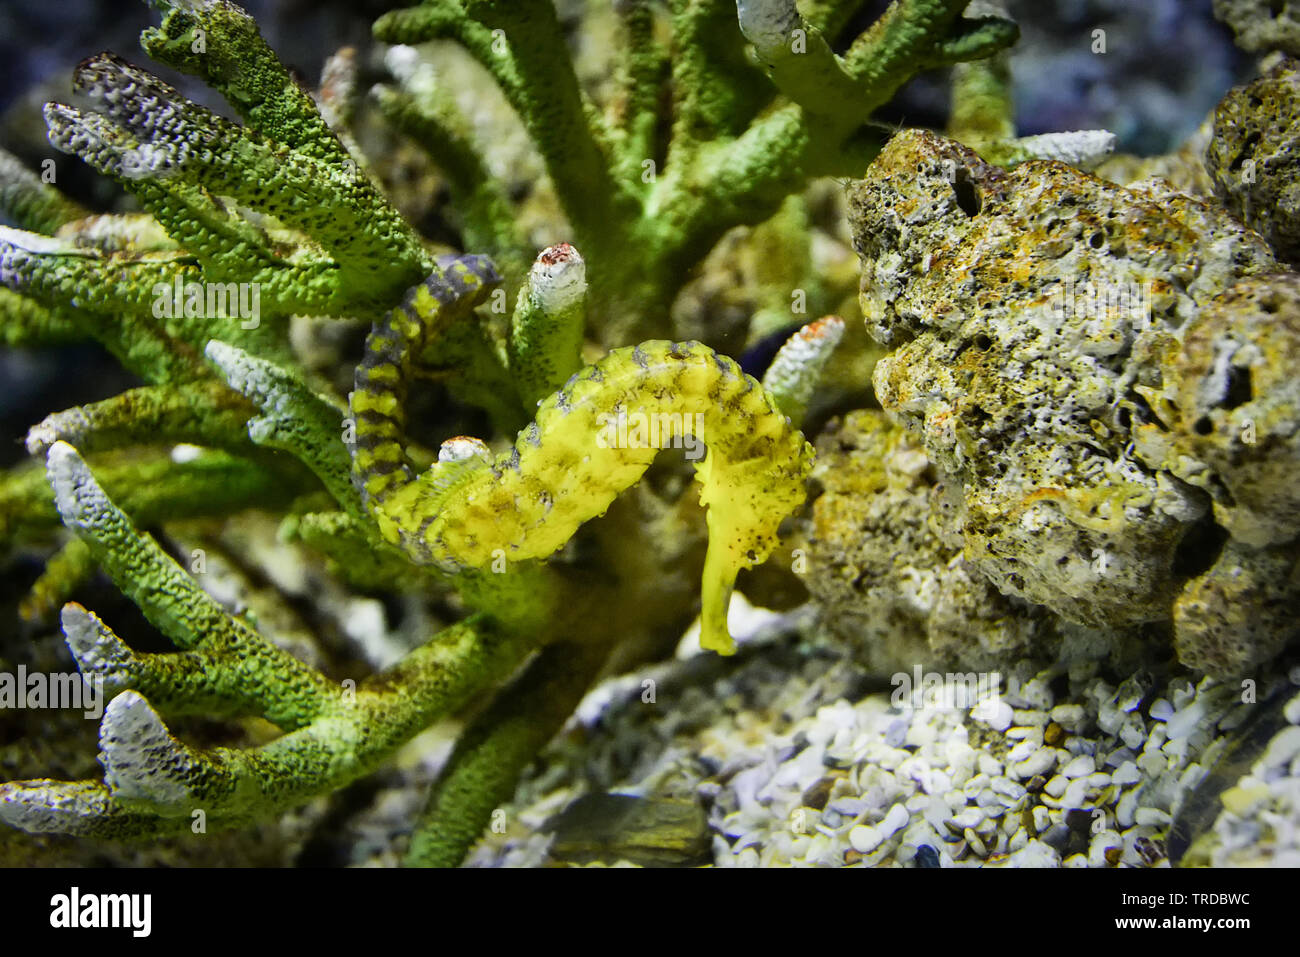 Thorny Seahorse Cute Sea Animal Beautiful Yellow Sea Horse Swimming Underwater Ocean Stock Photo Alamy